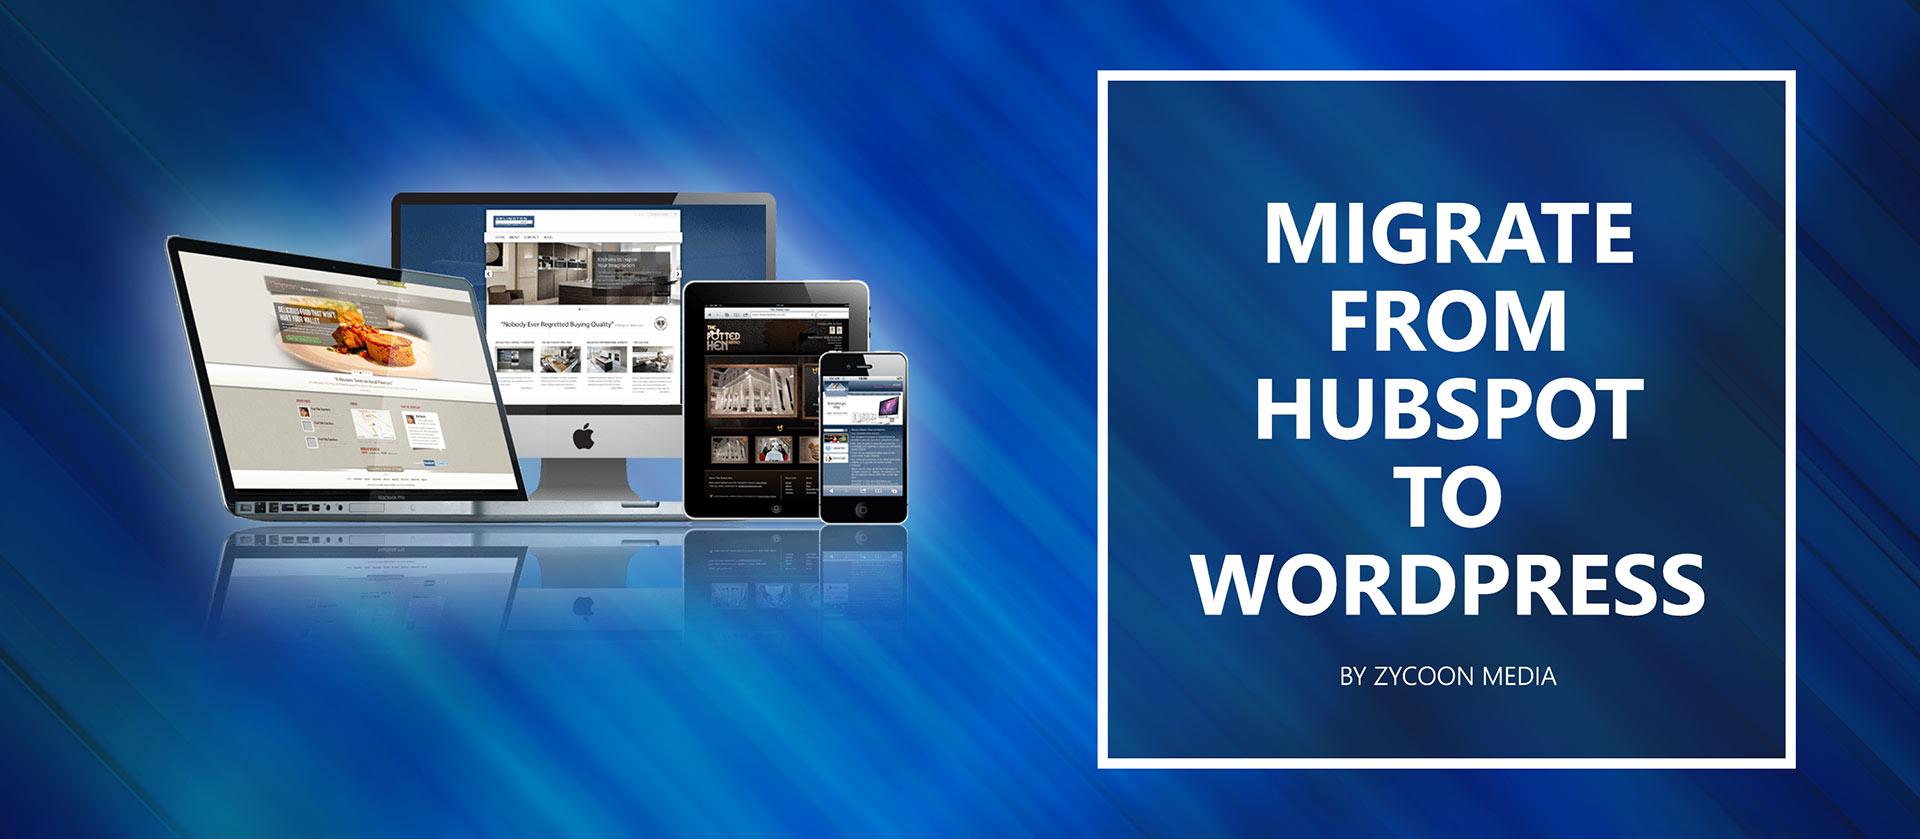 Move Hubspot Blog Wordpress Migration